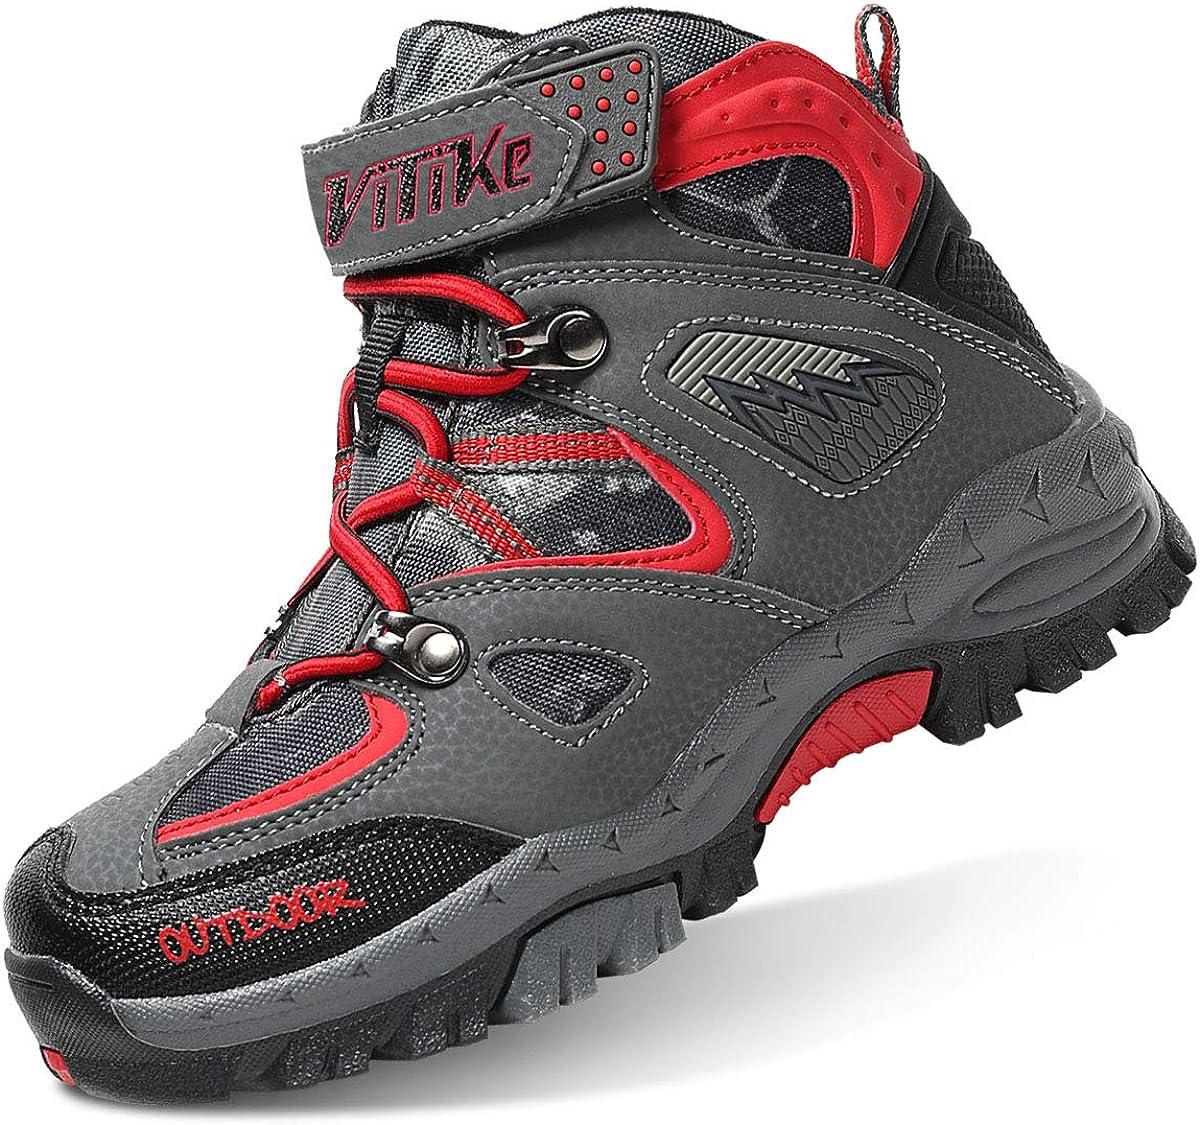 VITIKE Kids Boys Girls Snow Boots Cleat Ice With Award Hiking Kansas City Mall